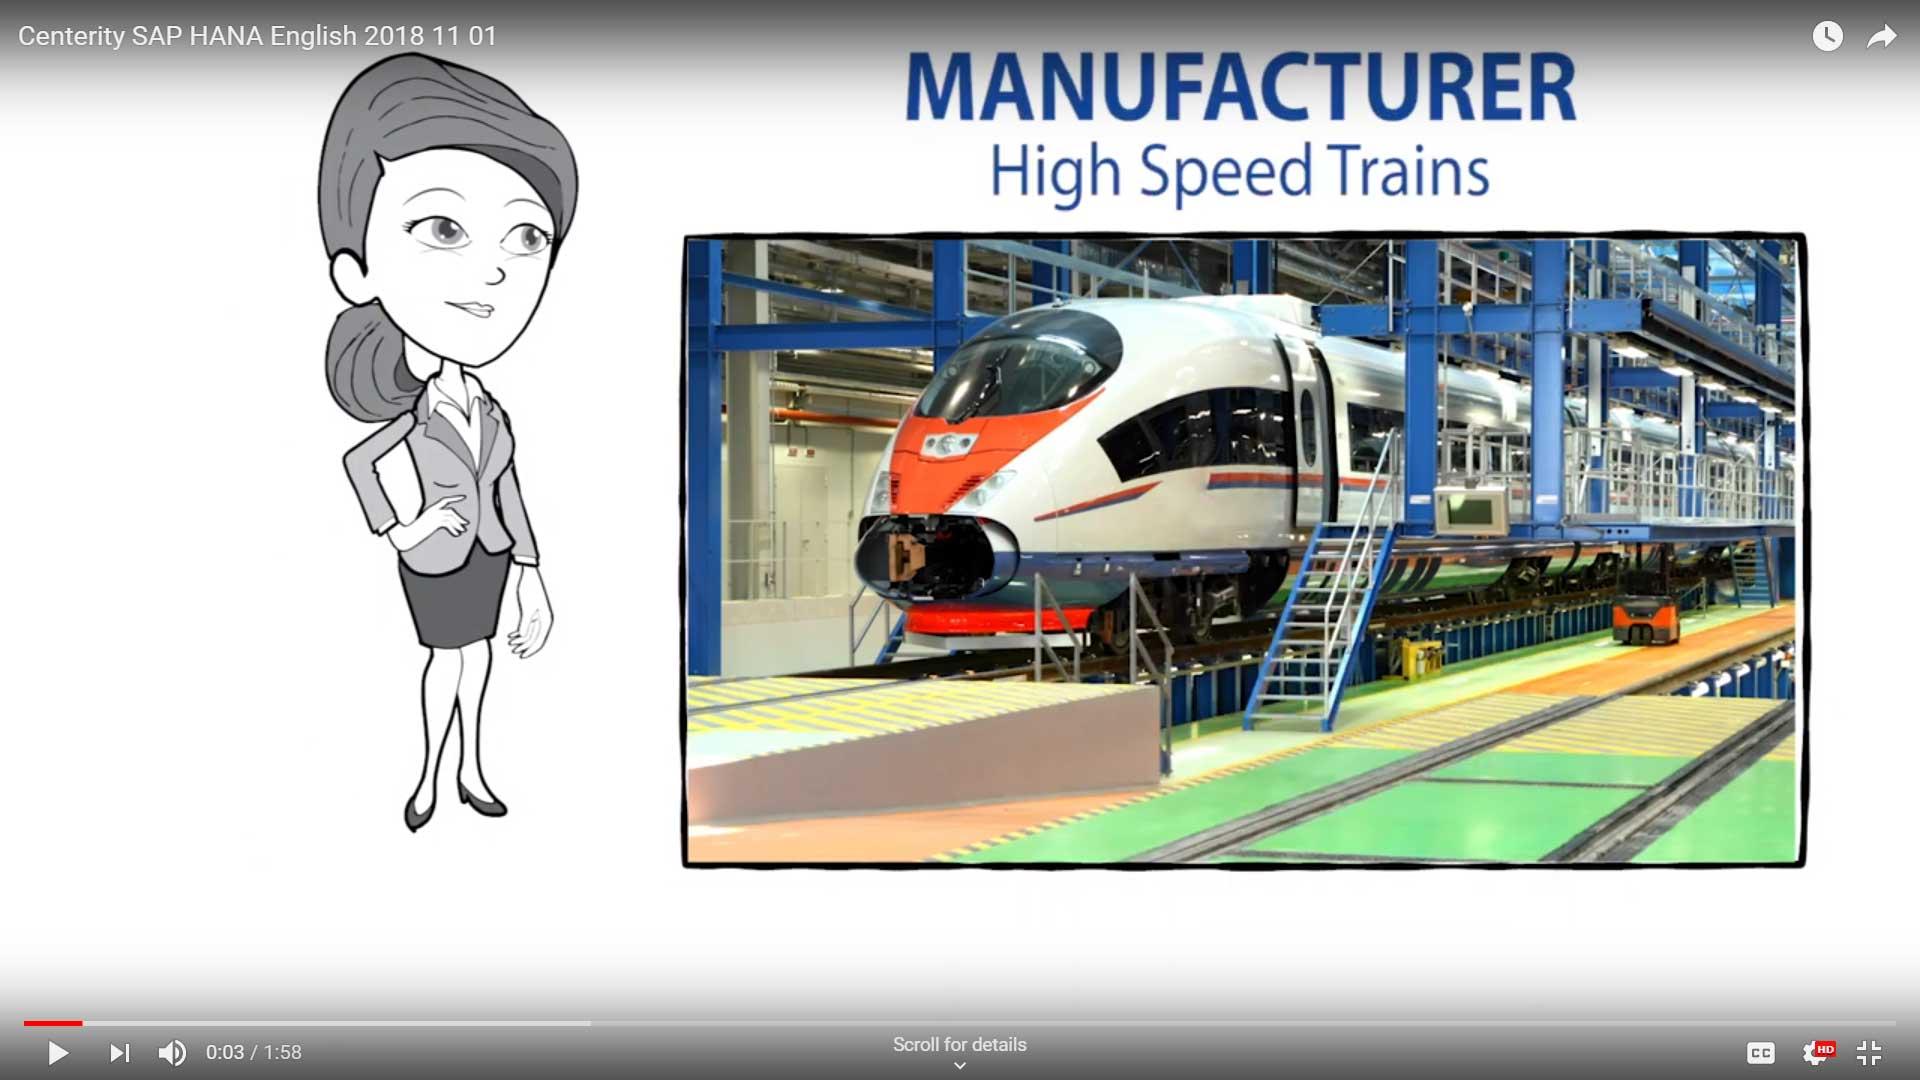 Video – Ensuring High Performance for SAP HANA